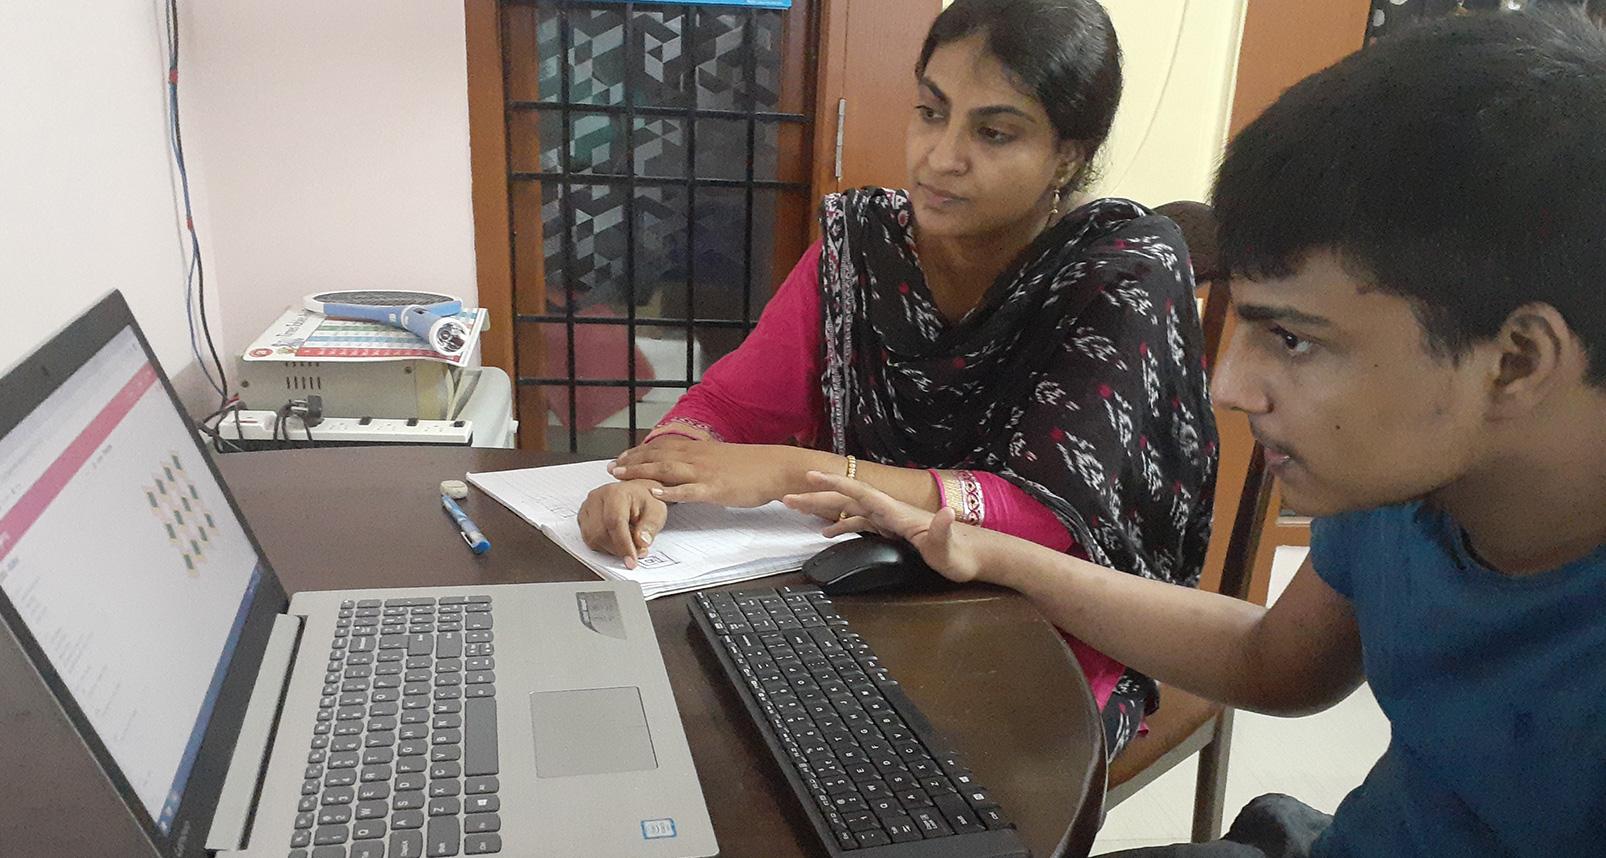 Establishing the right foundation for one's growth – The fulfilling journey of budding coder Sadiq